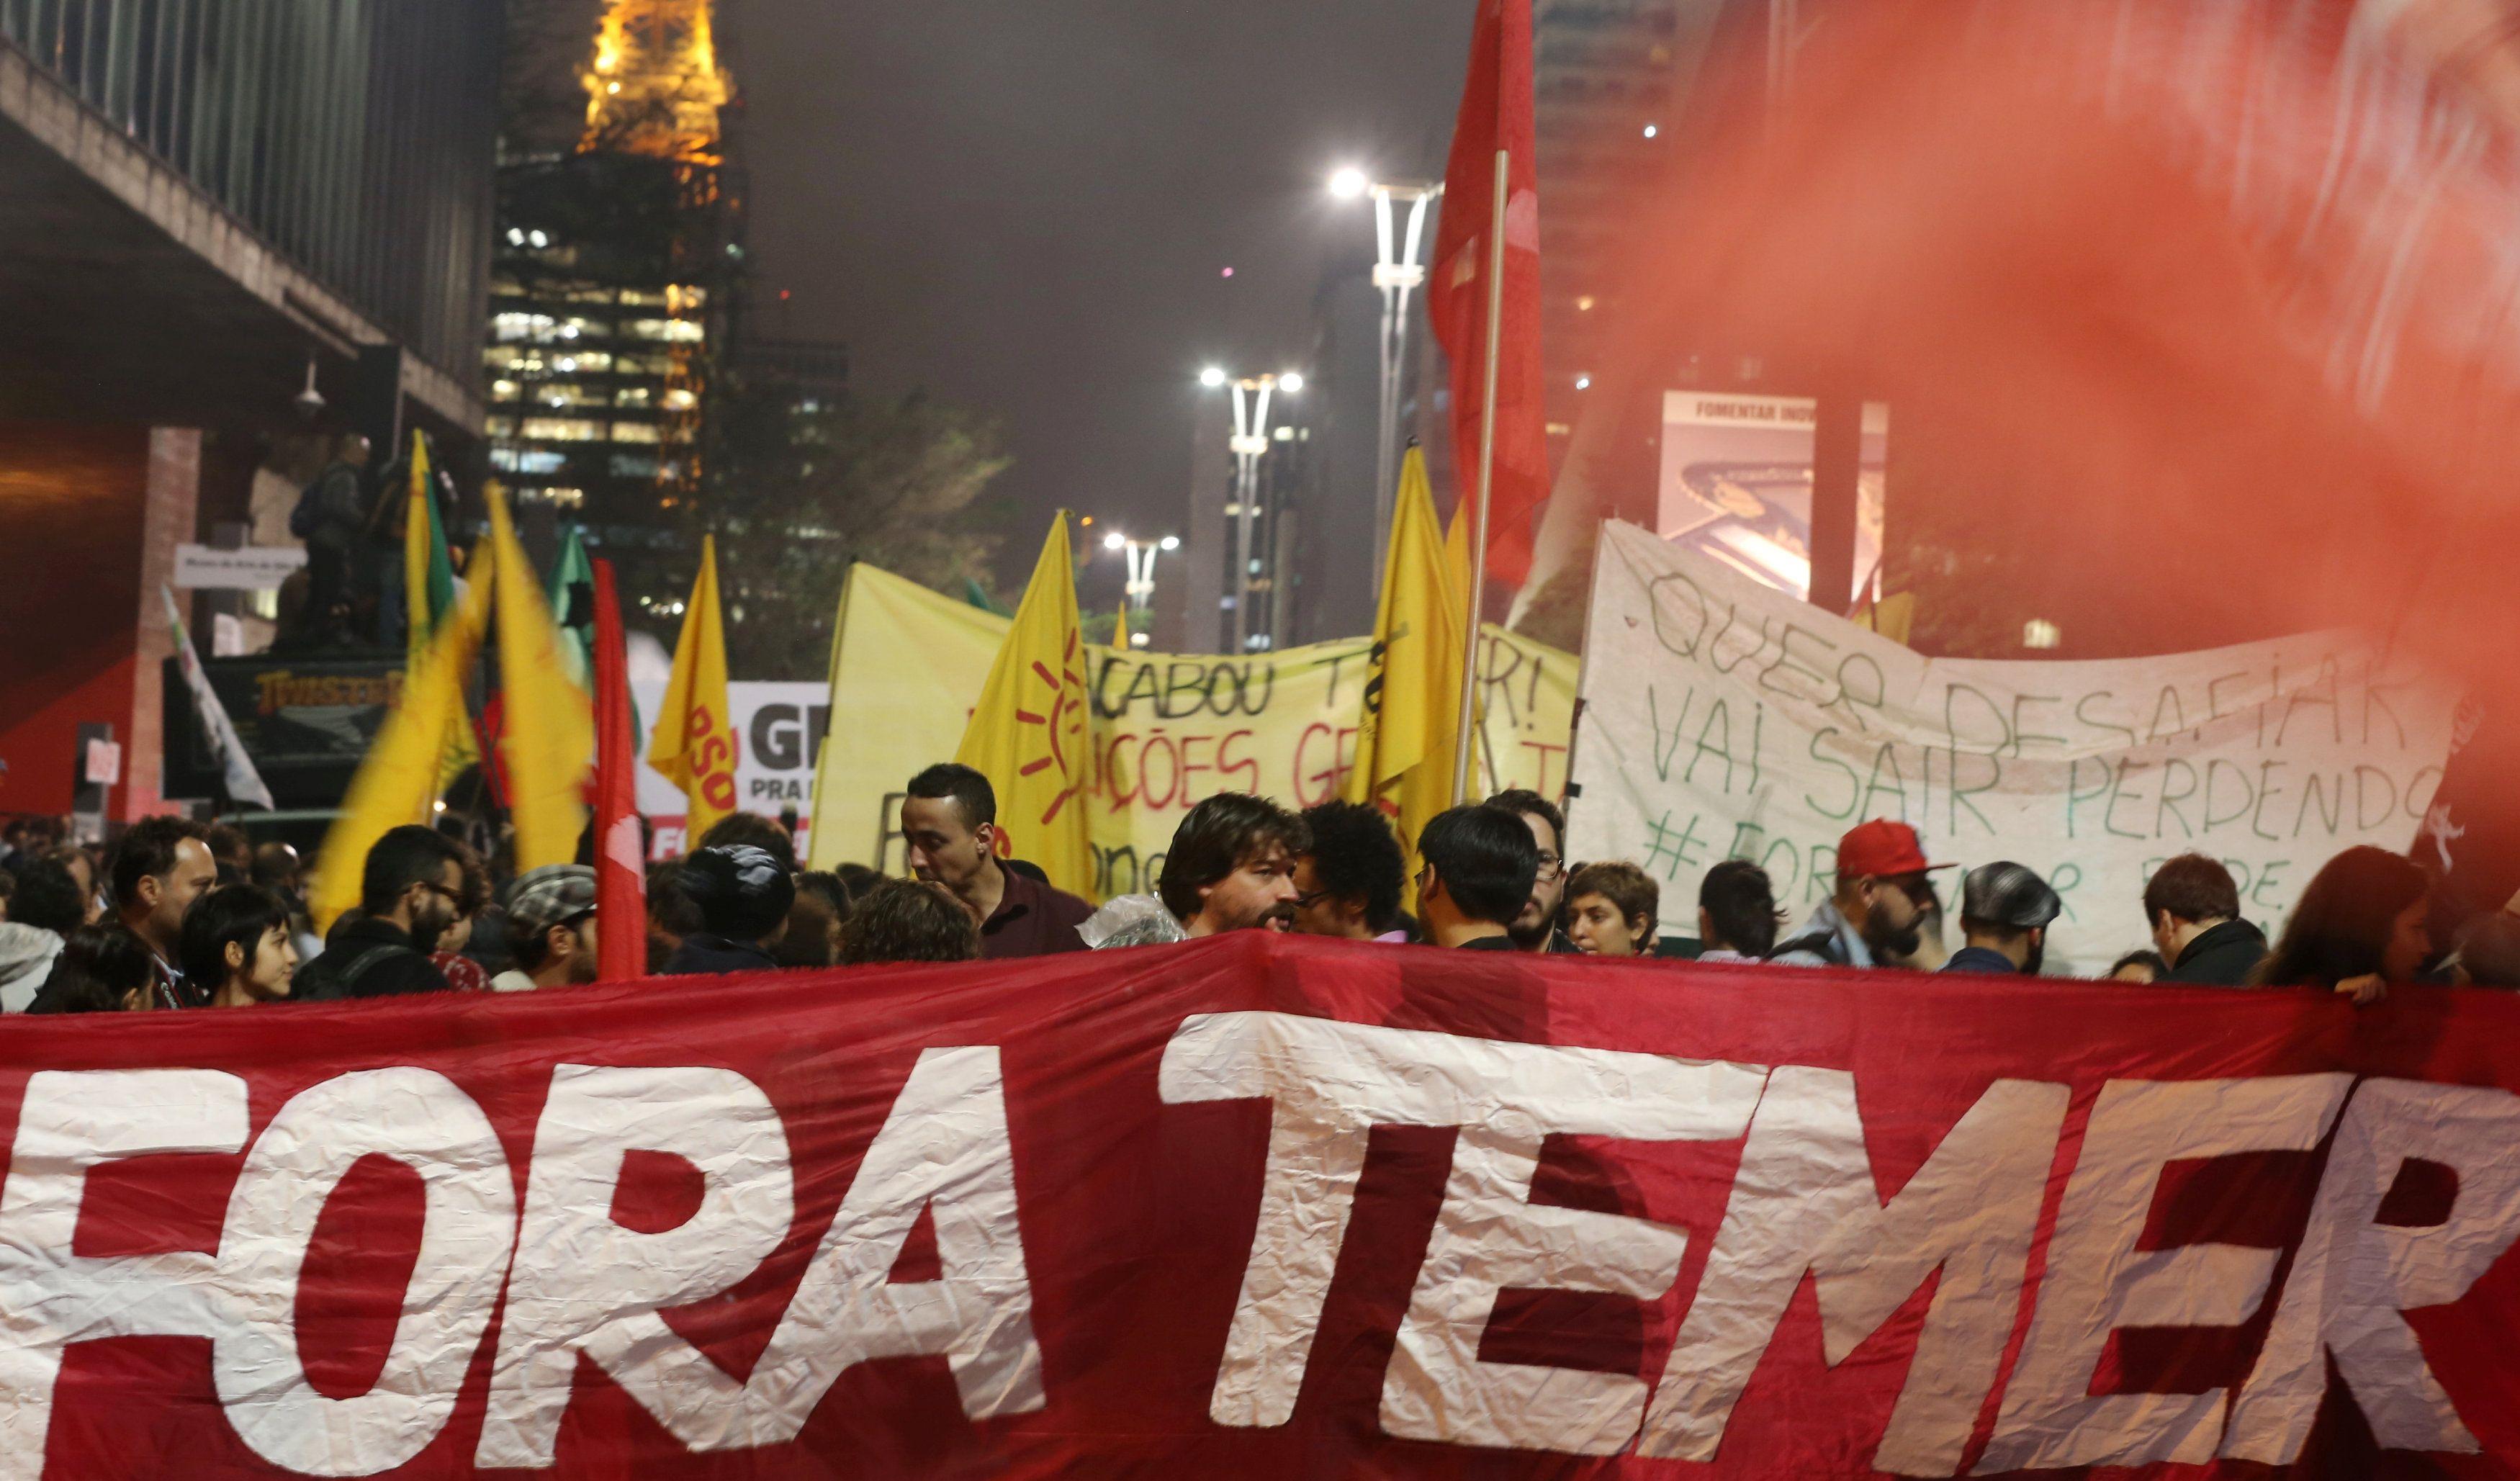 Protesto contra o presidente Temer na Avenida Paulista, em São Paulo / Paulo Whitaker/Reuters